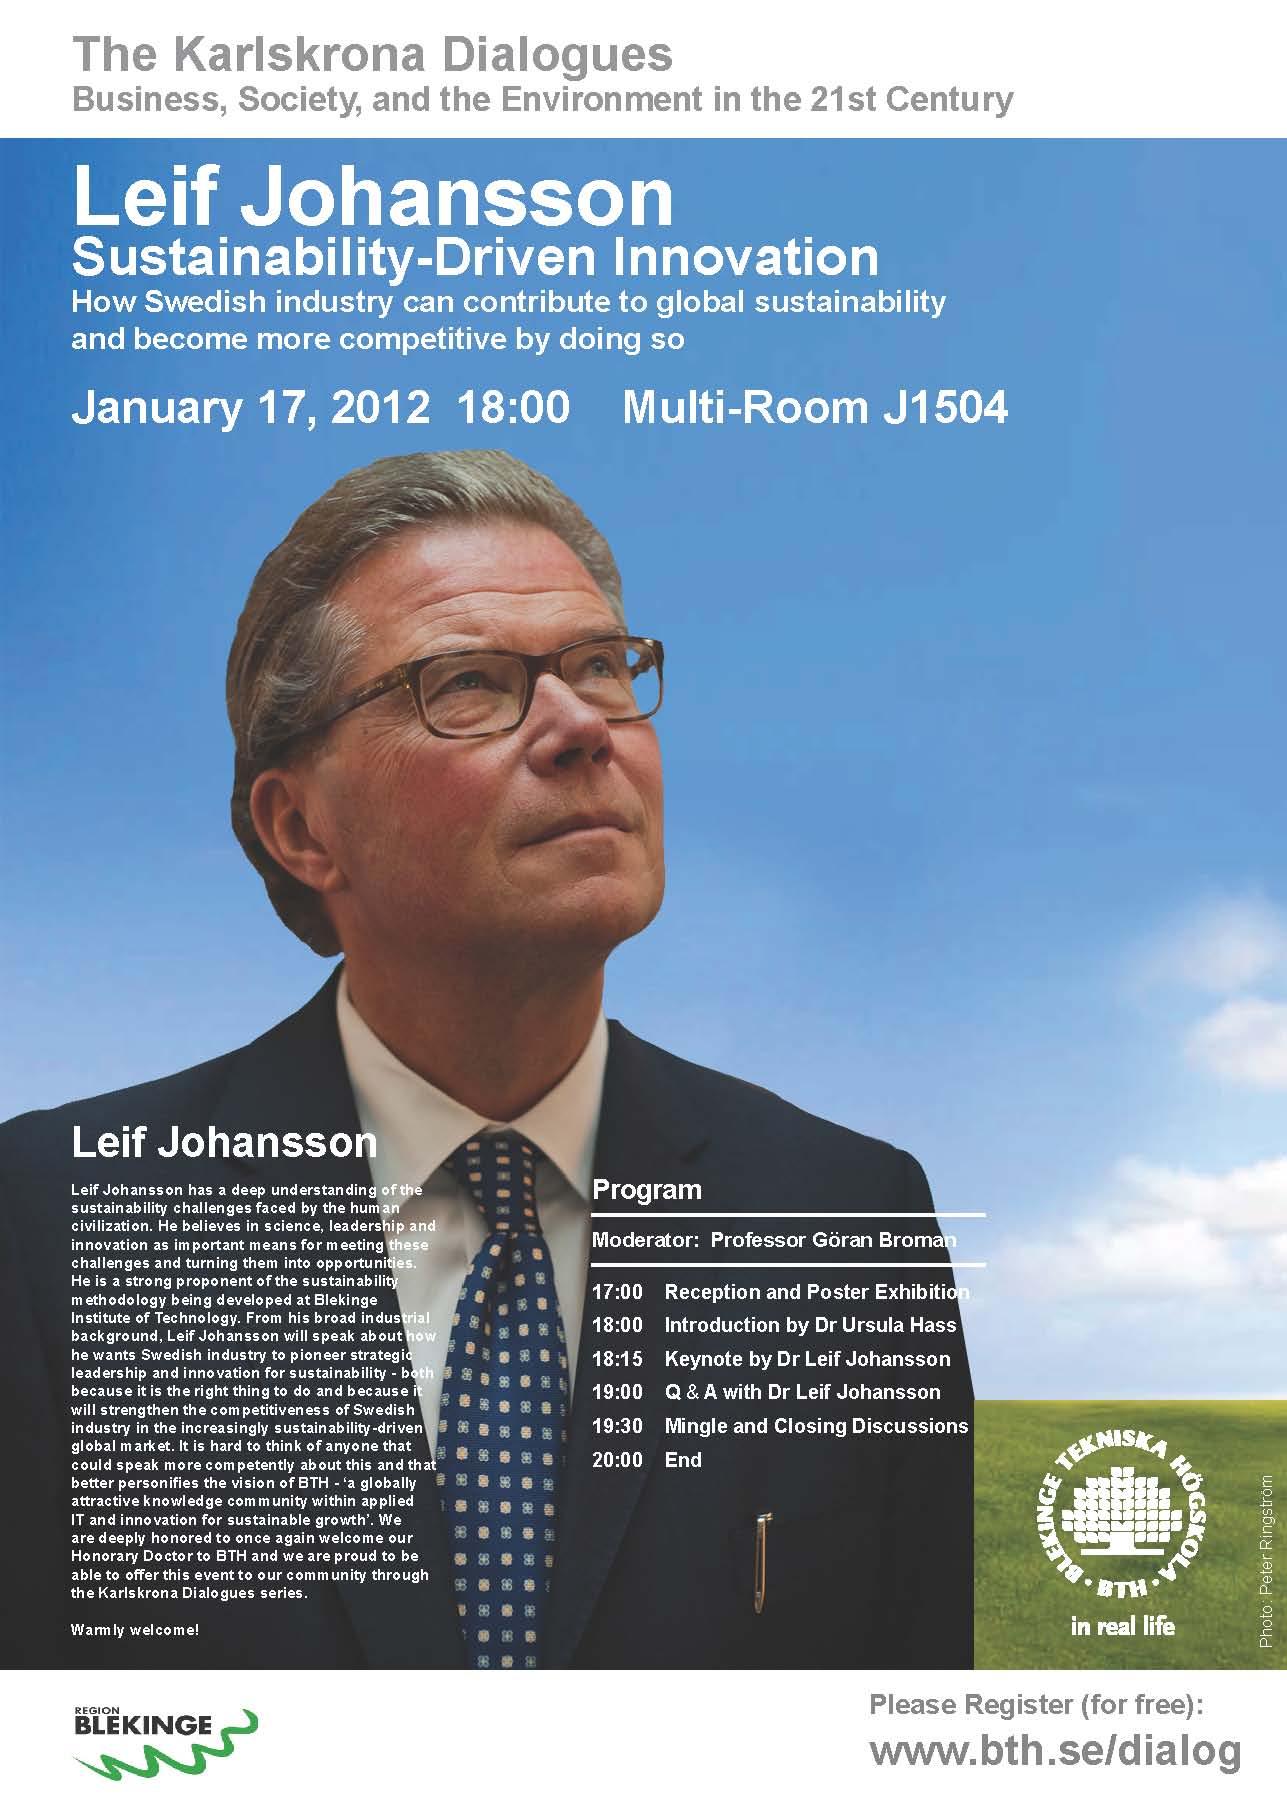 Poster Karlskrona Dialogues January 2011